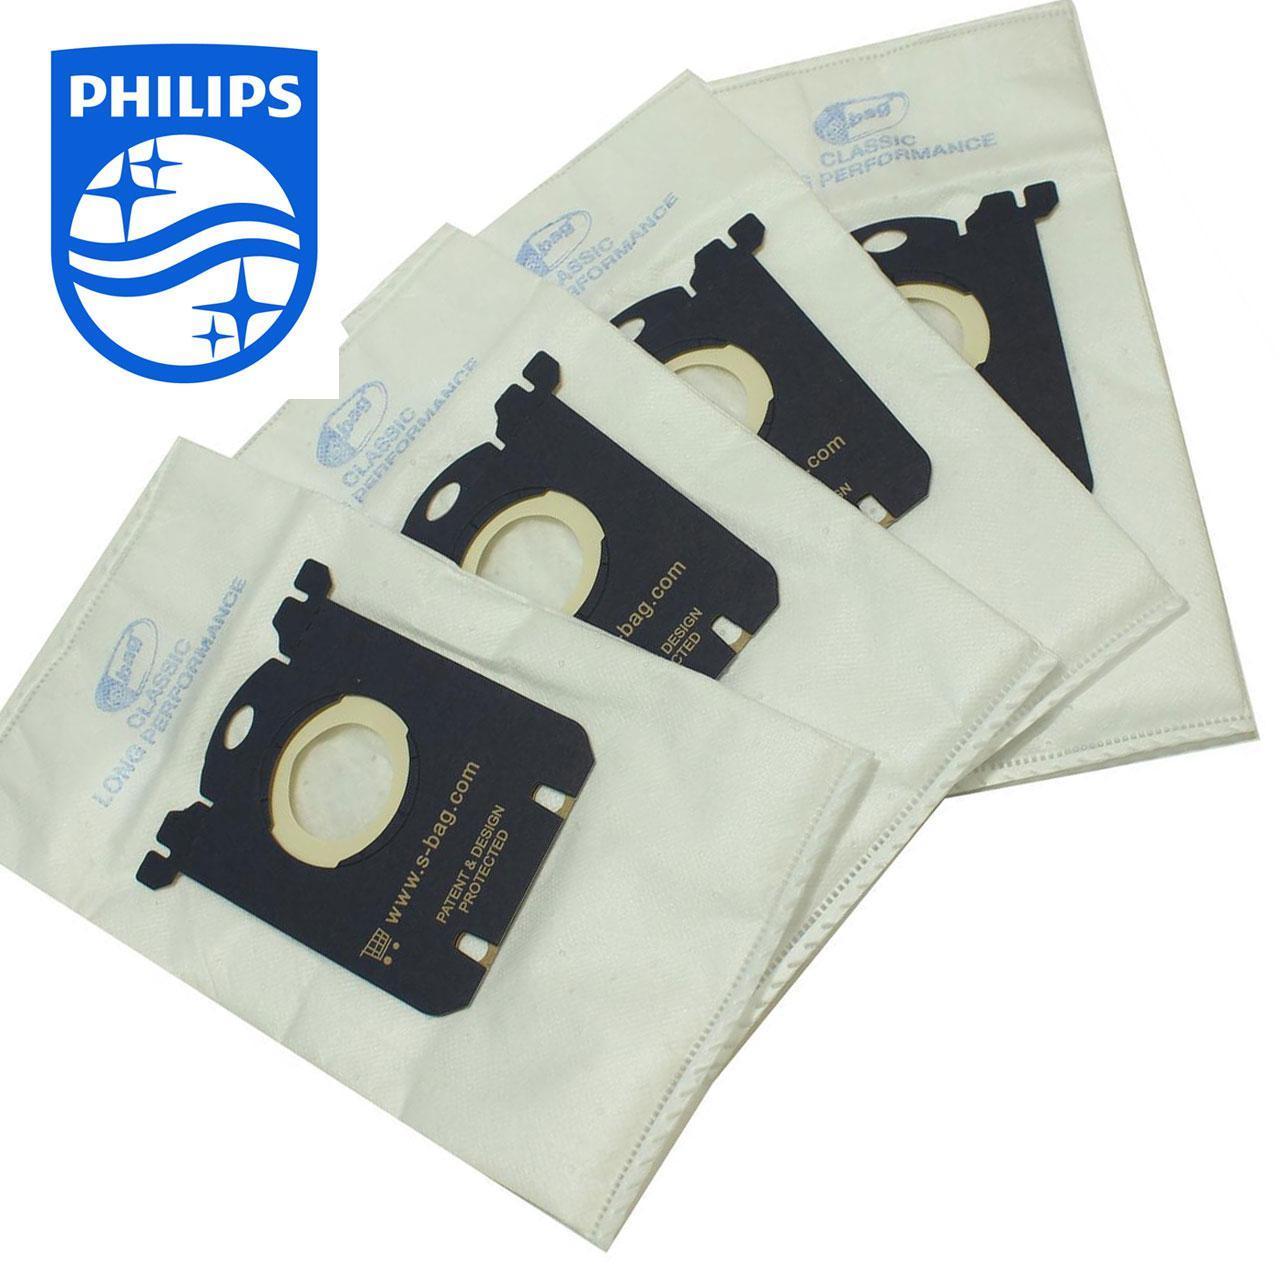 Комплект мешков к пылесосу Philips S-BAG Classic Long Performance (4 шт)